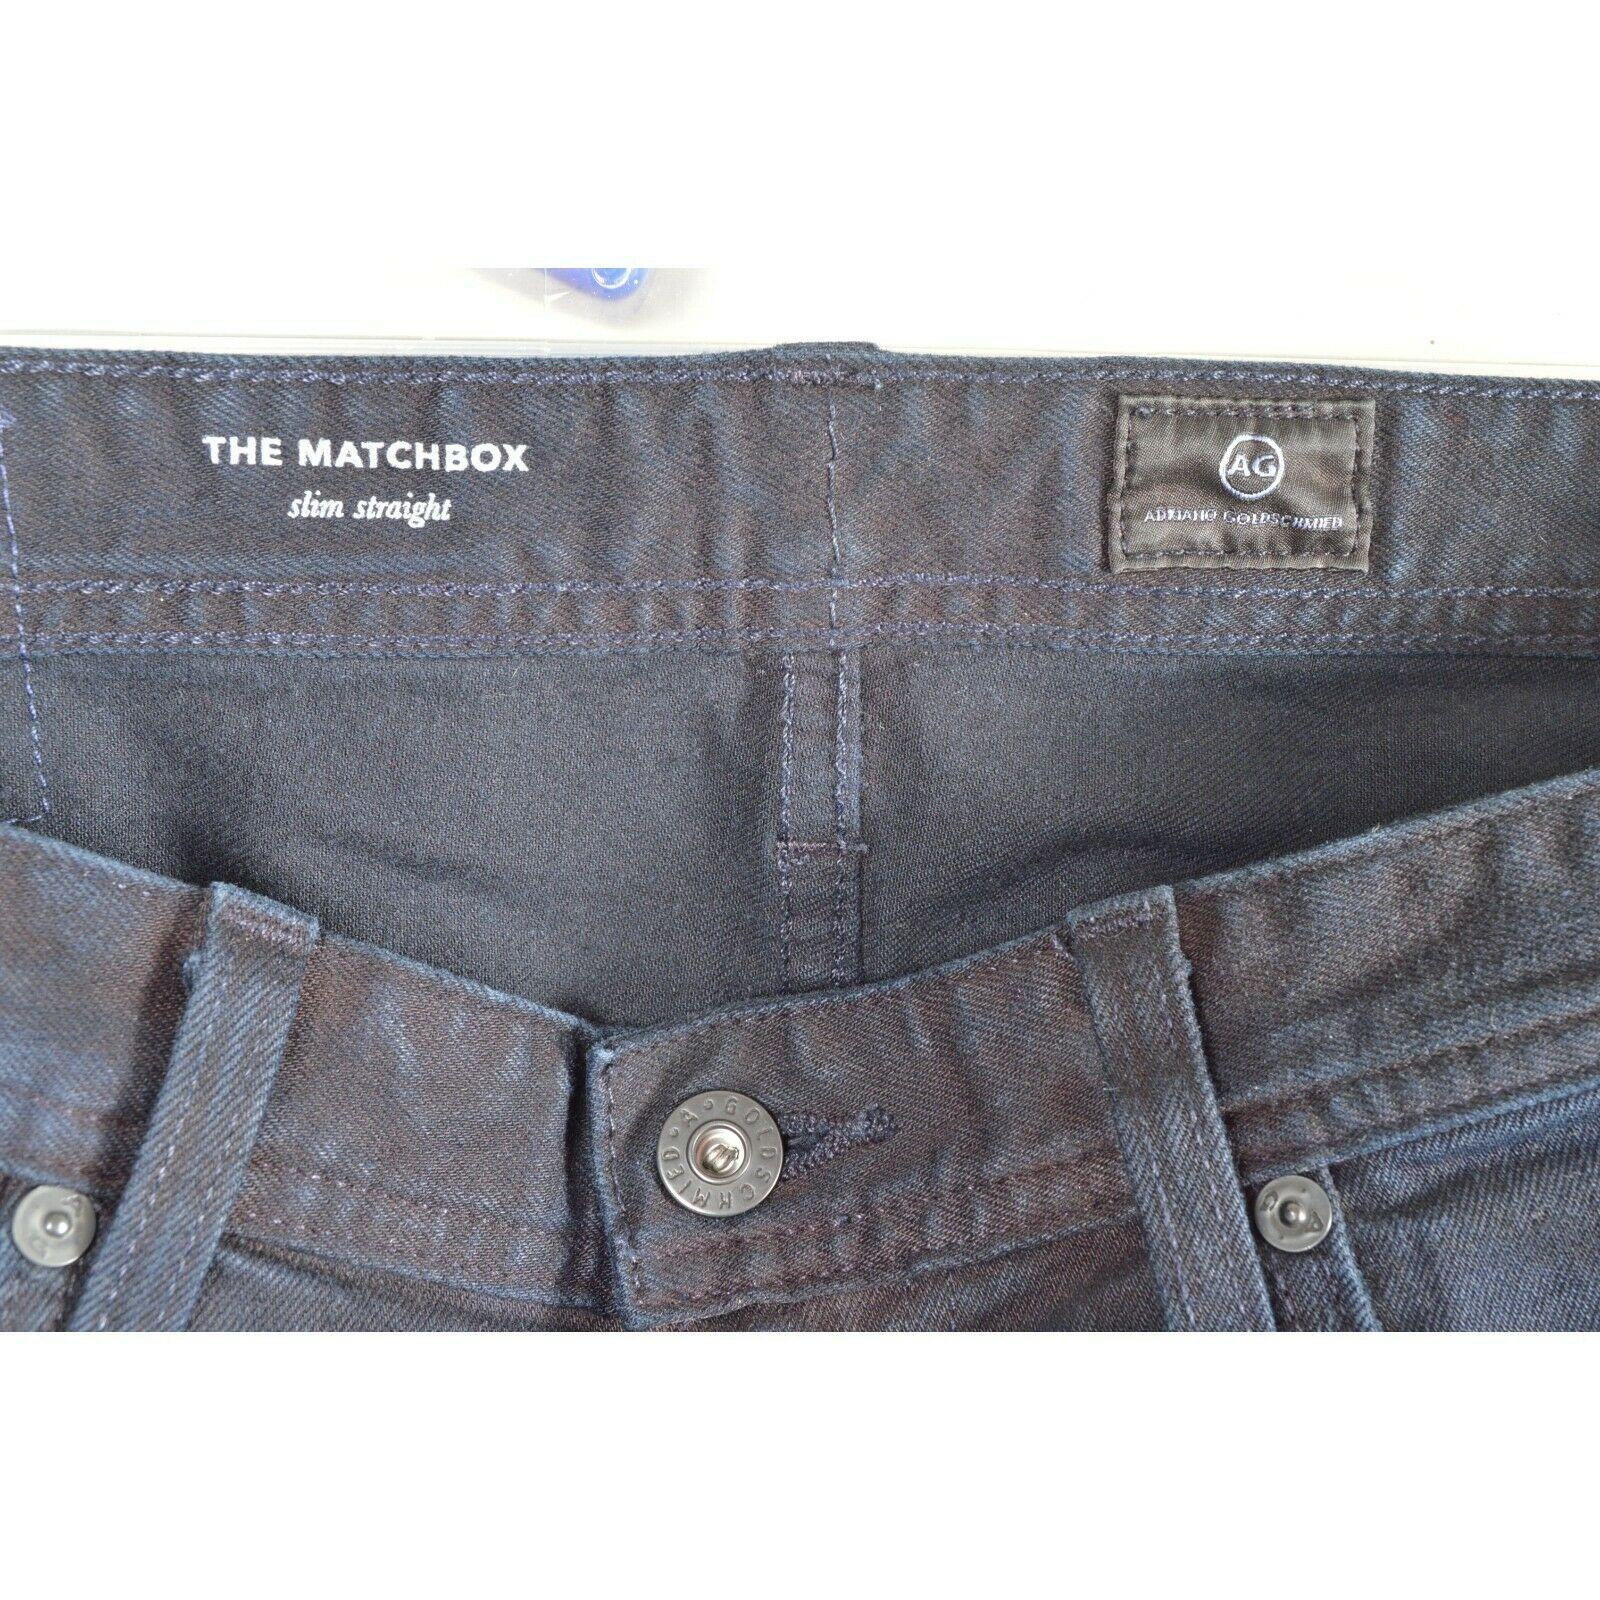 AG Adriano Goldschmied jeans 30 x 34 men Matchbox dark Slim Straight tall unique image 5